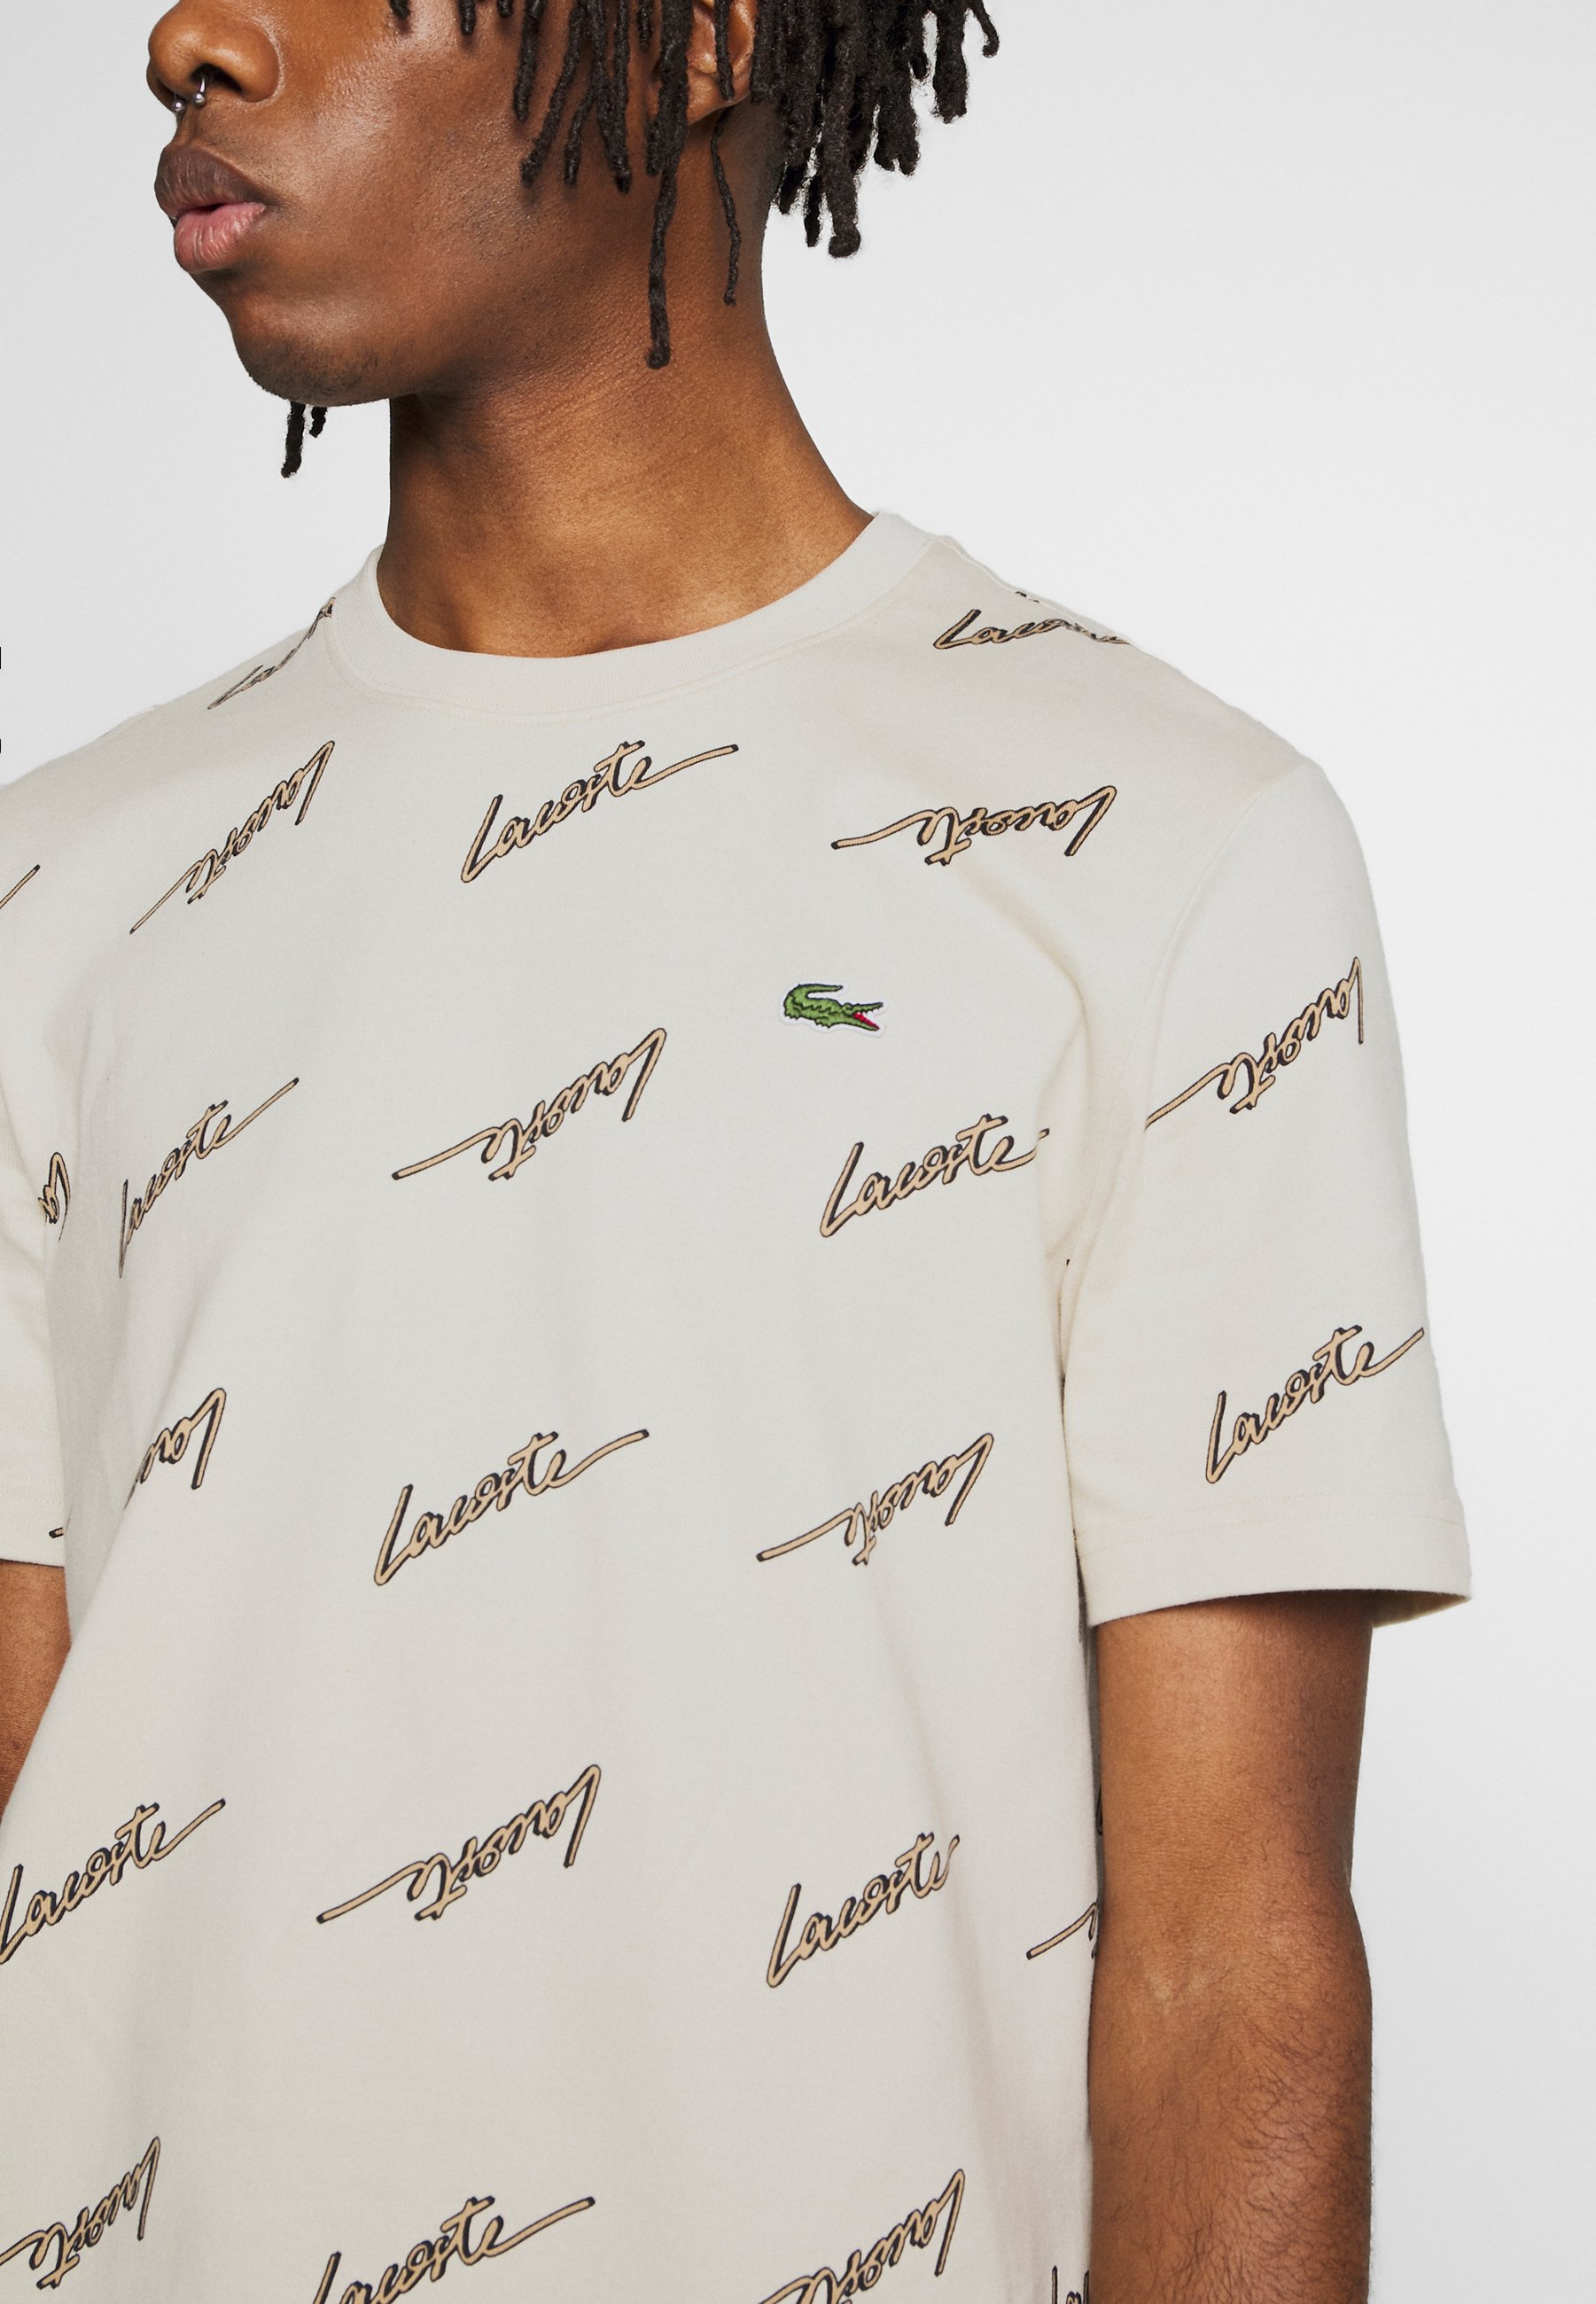 Lacoste LIVE Print T-shirt - marten/viennese O4VBN